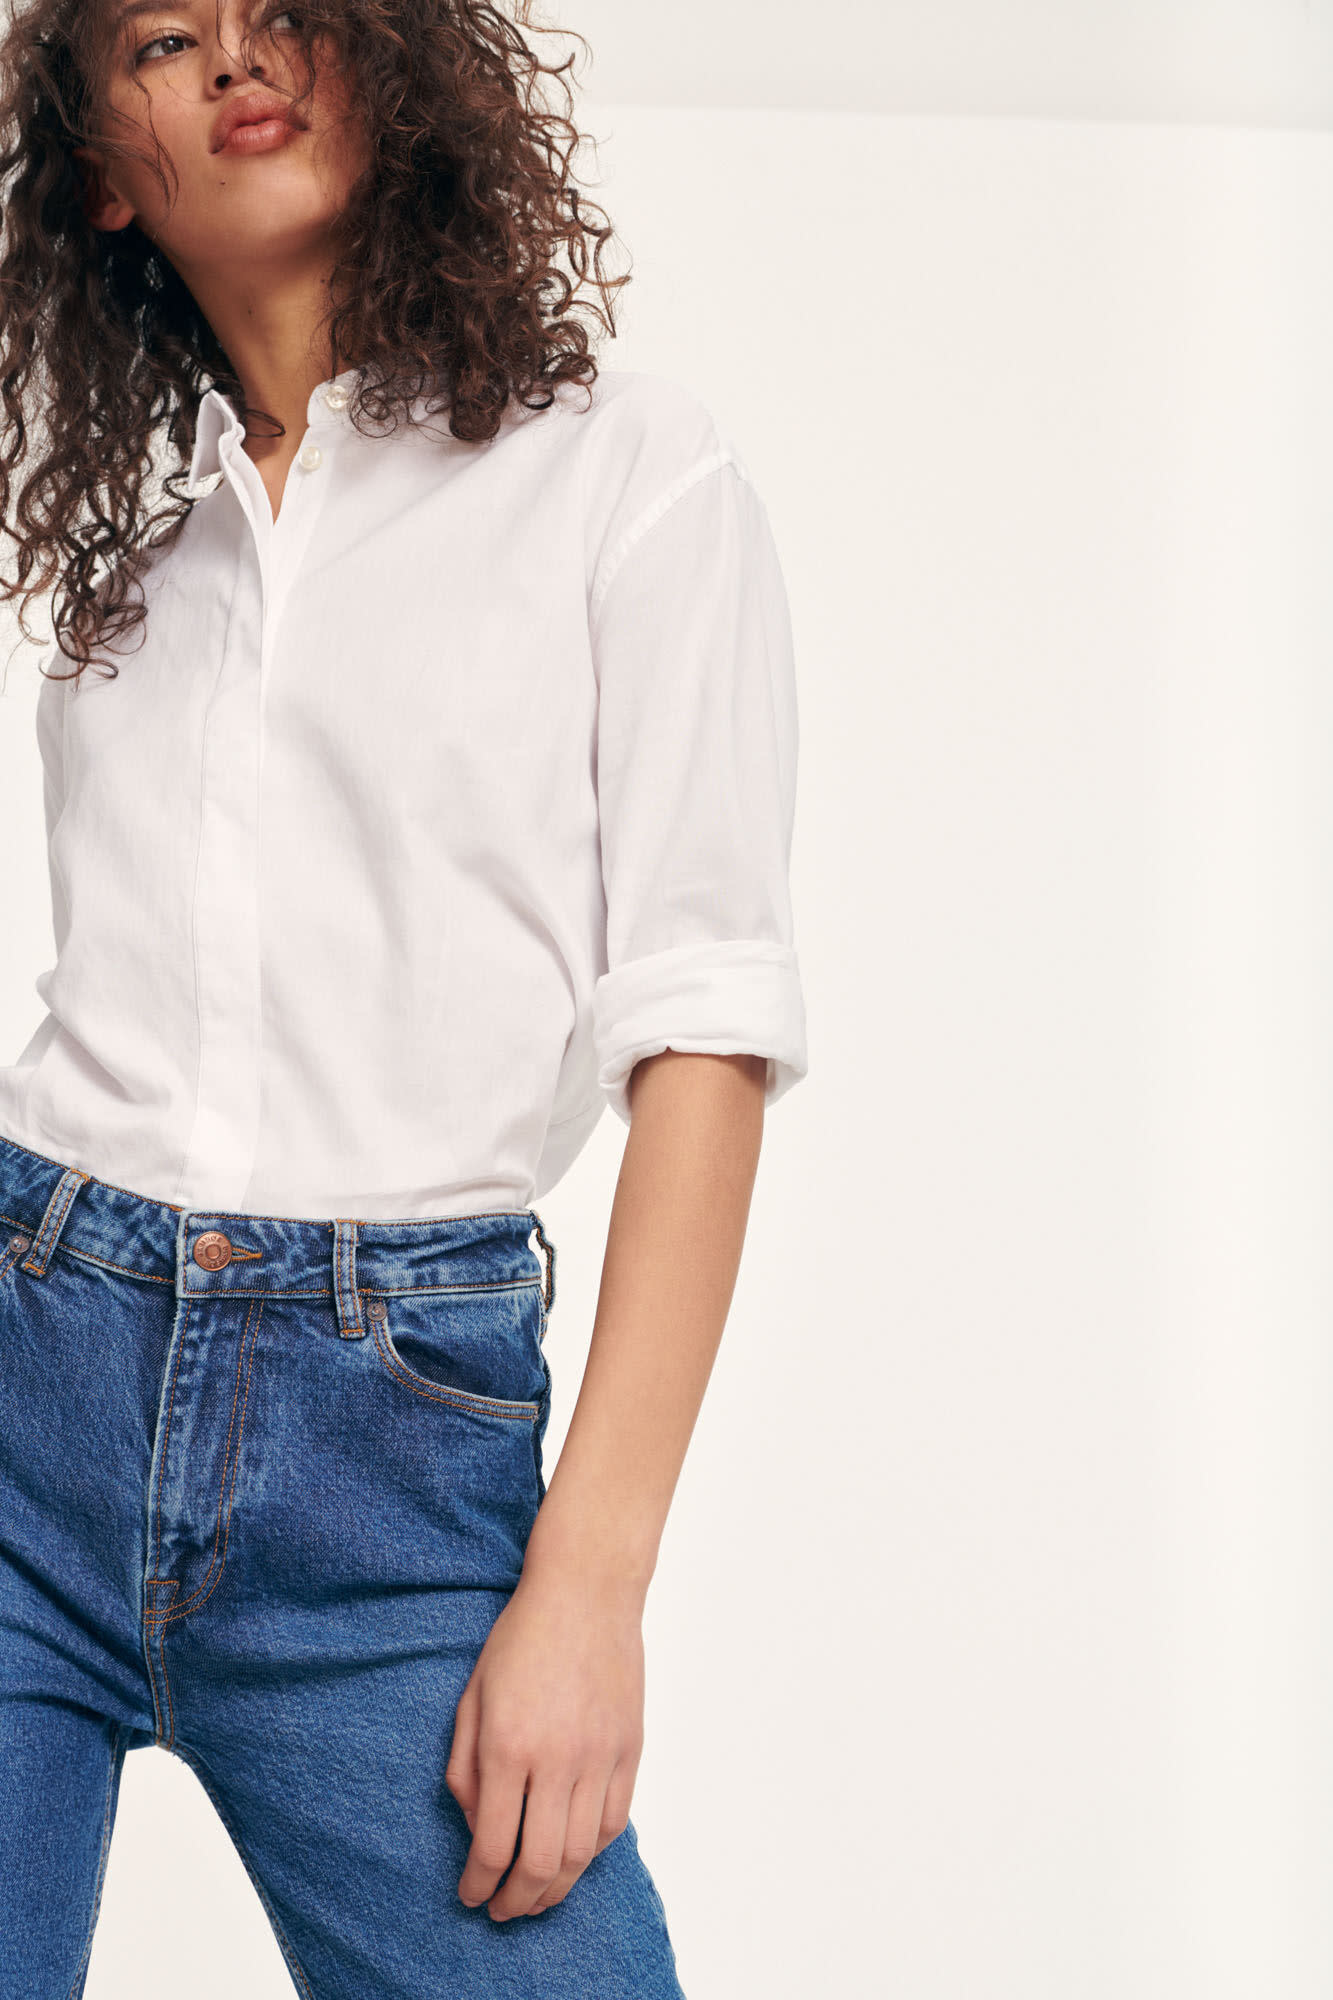 Caico Basic Shirt Wit 2634-3